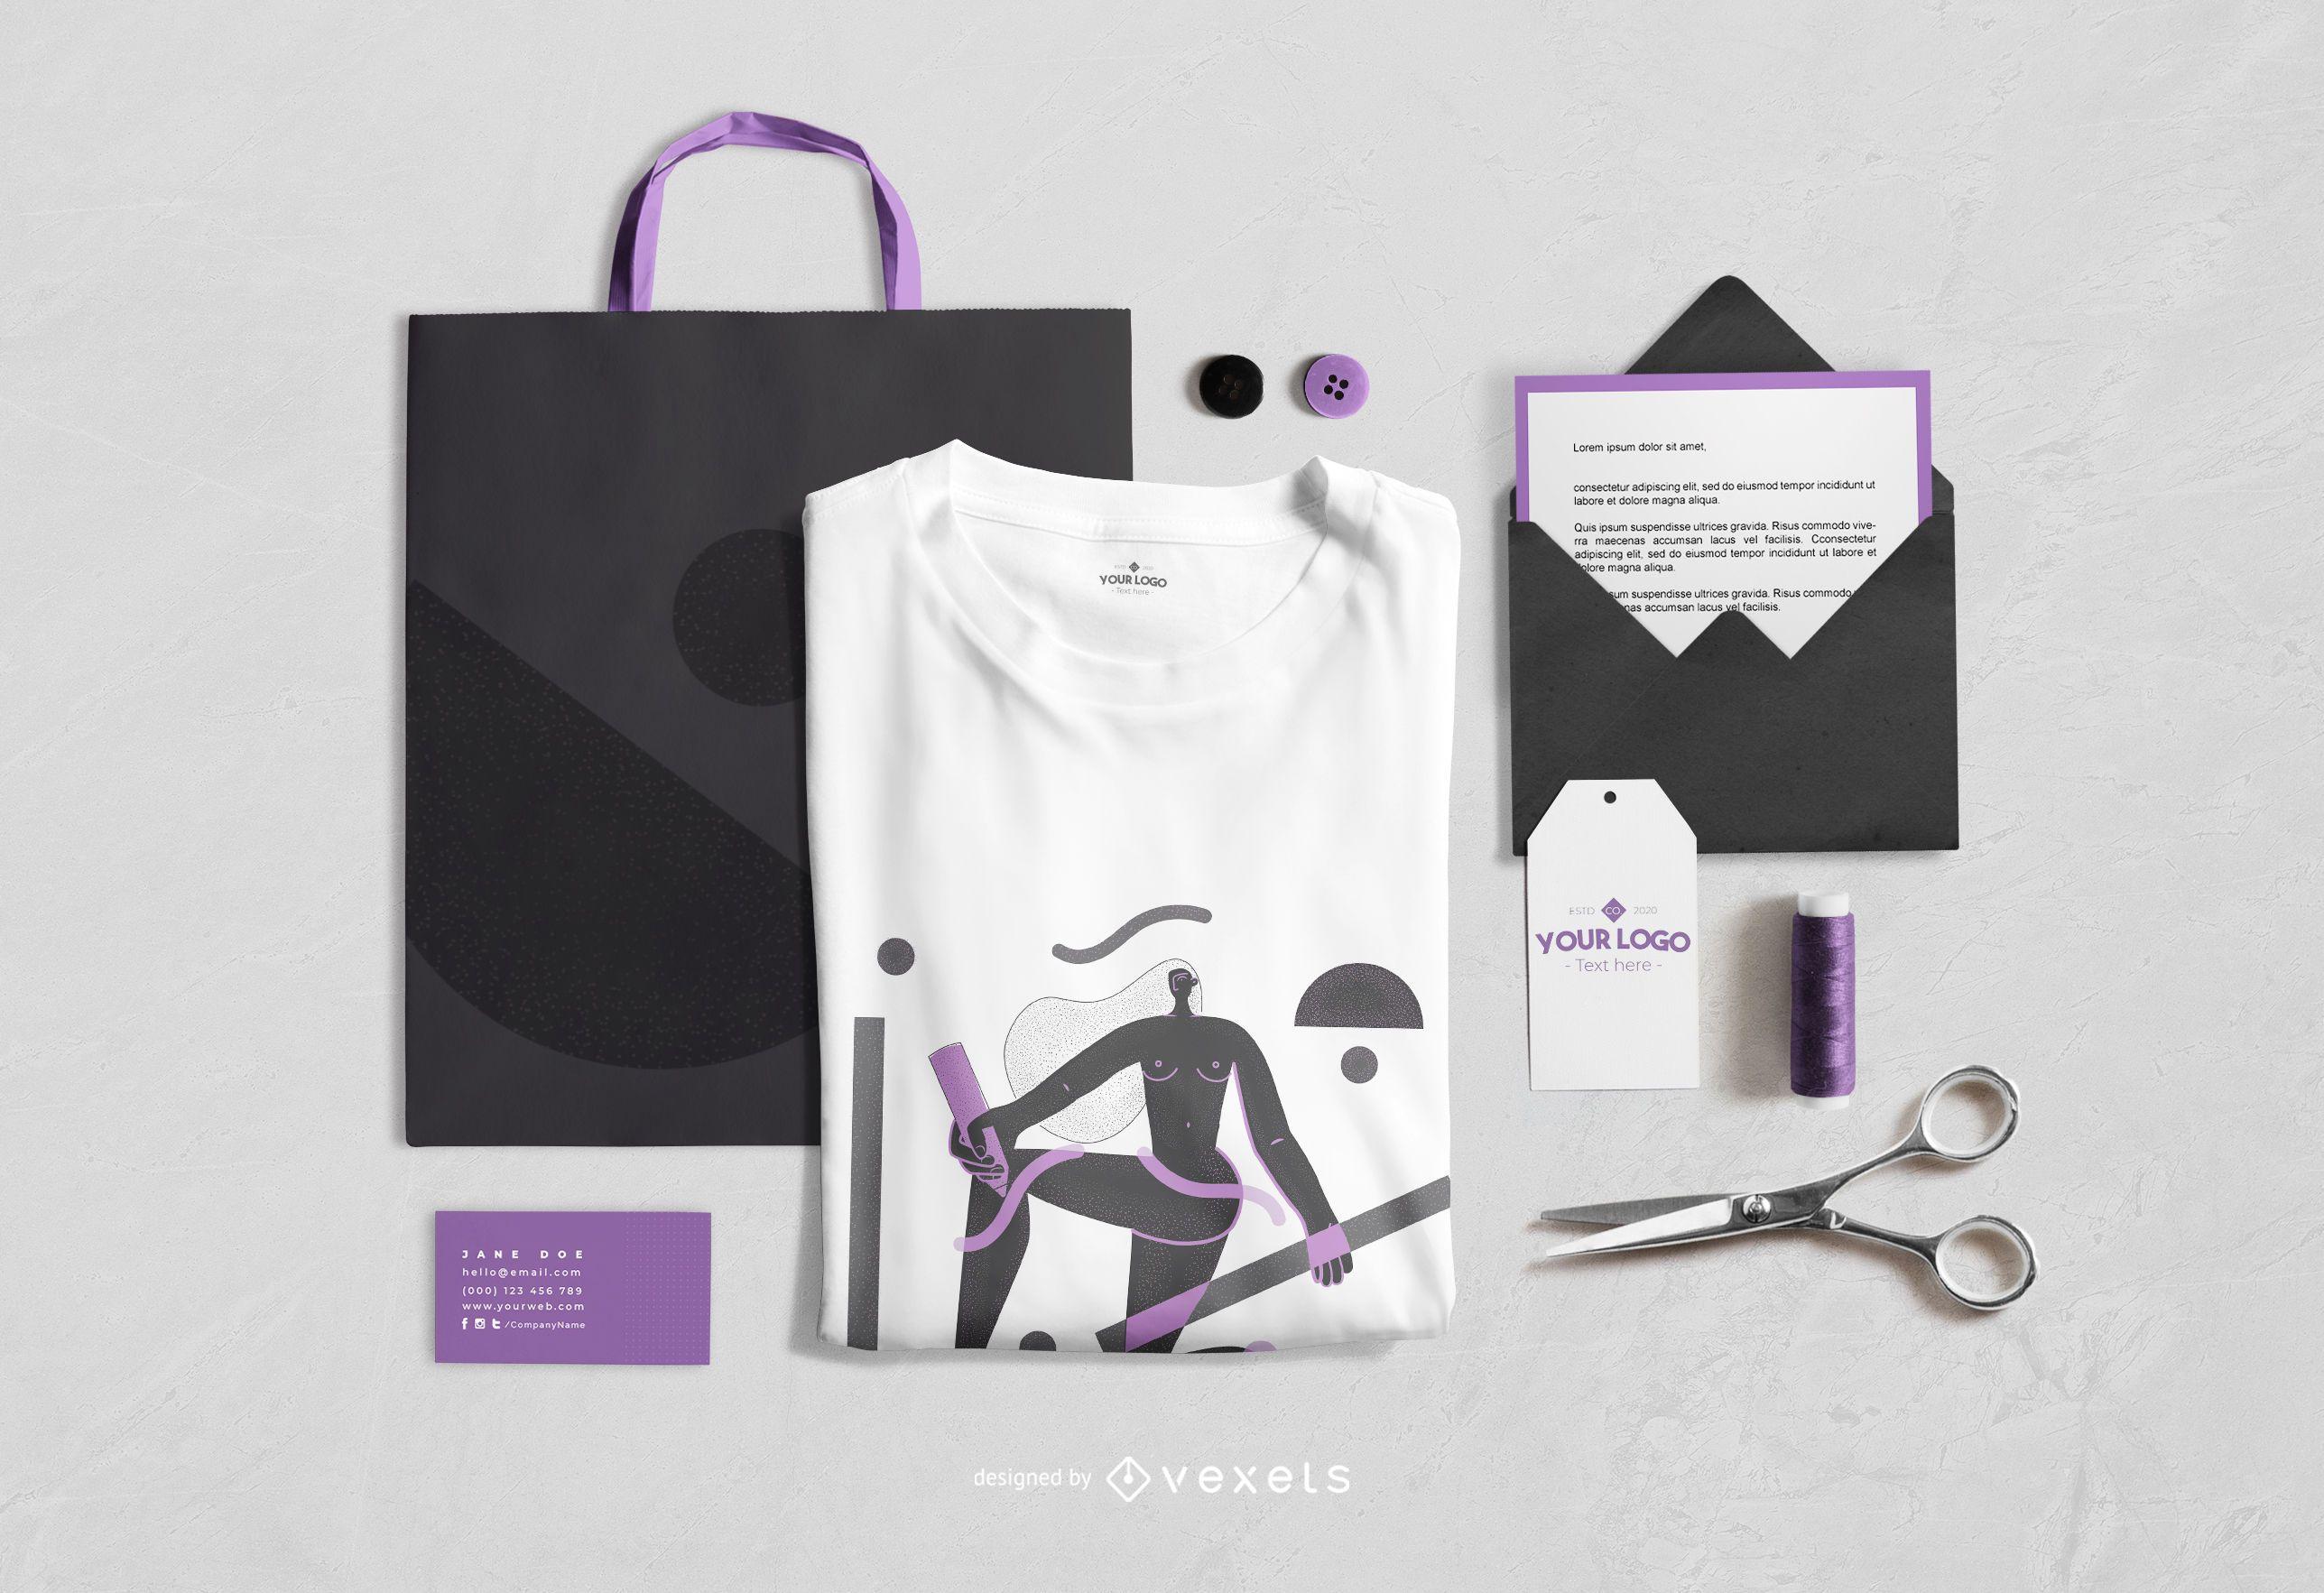 Maqueta de mezcla de elementos de marca